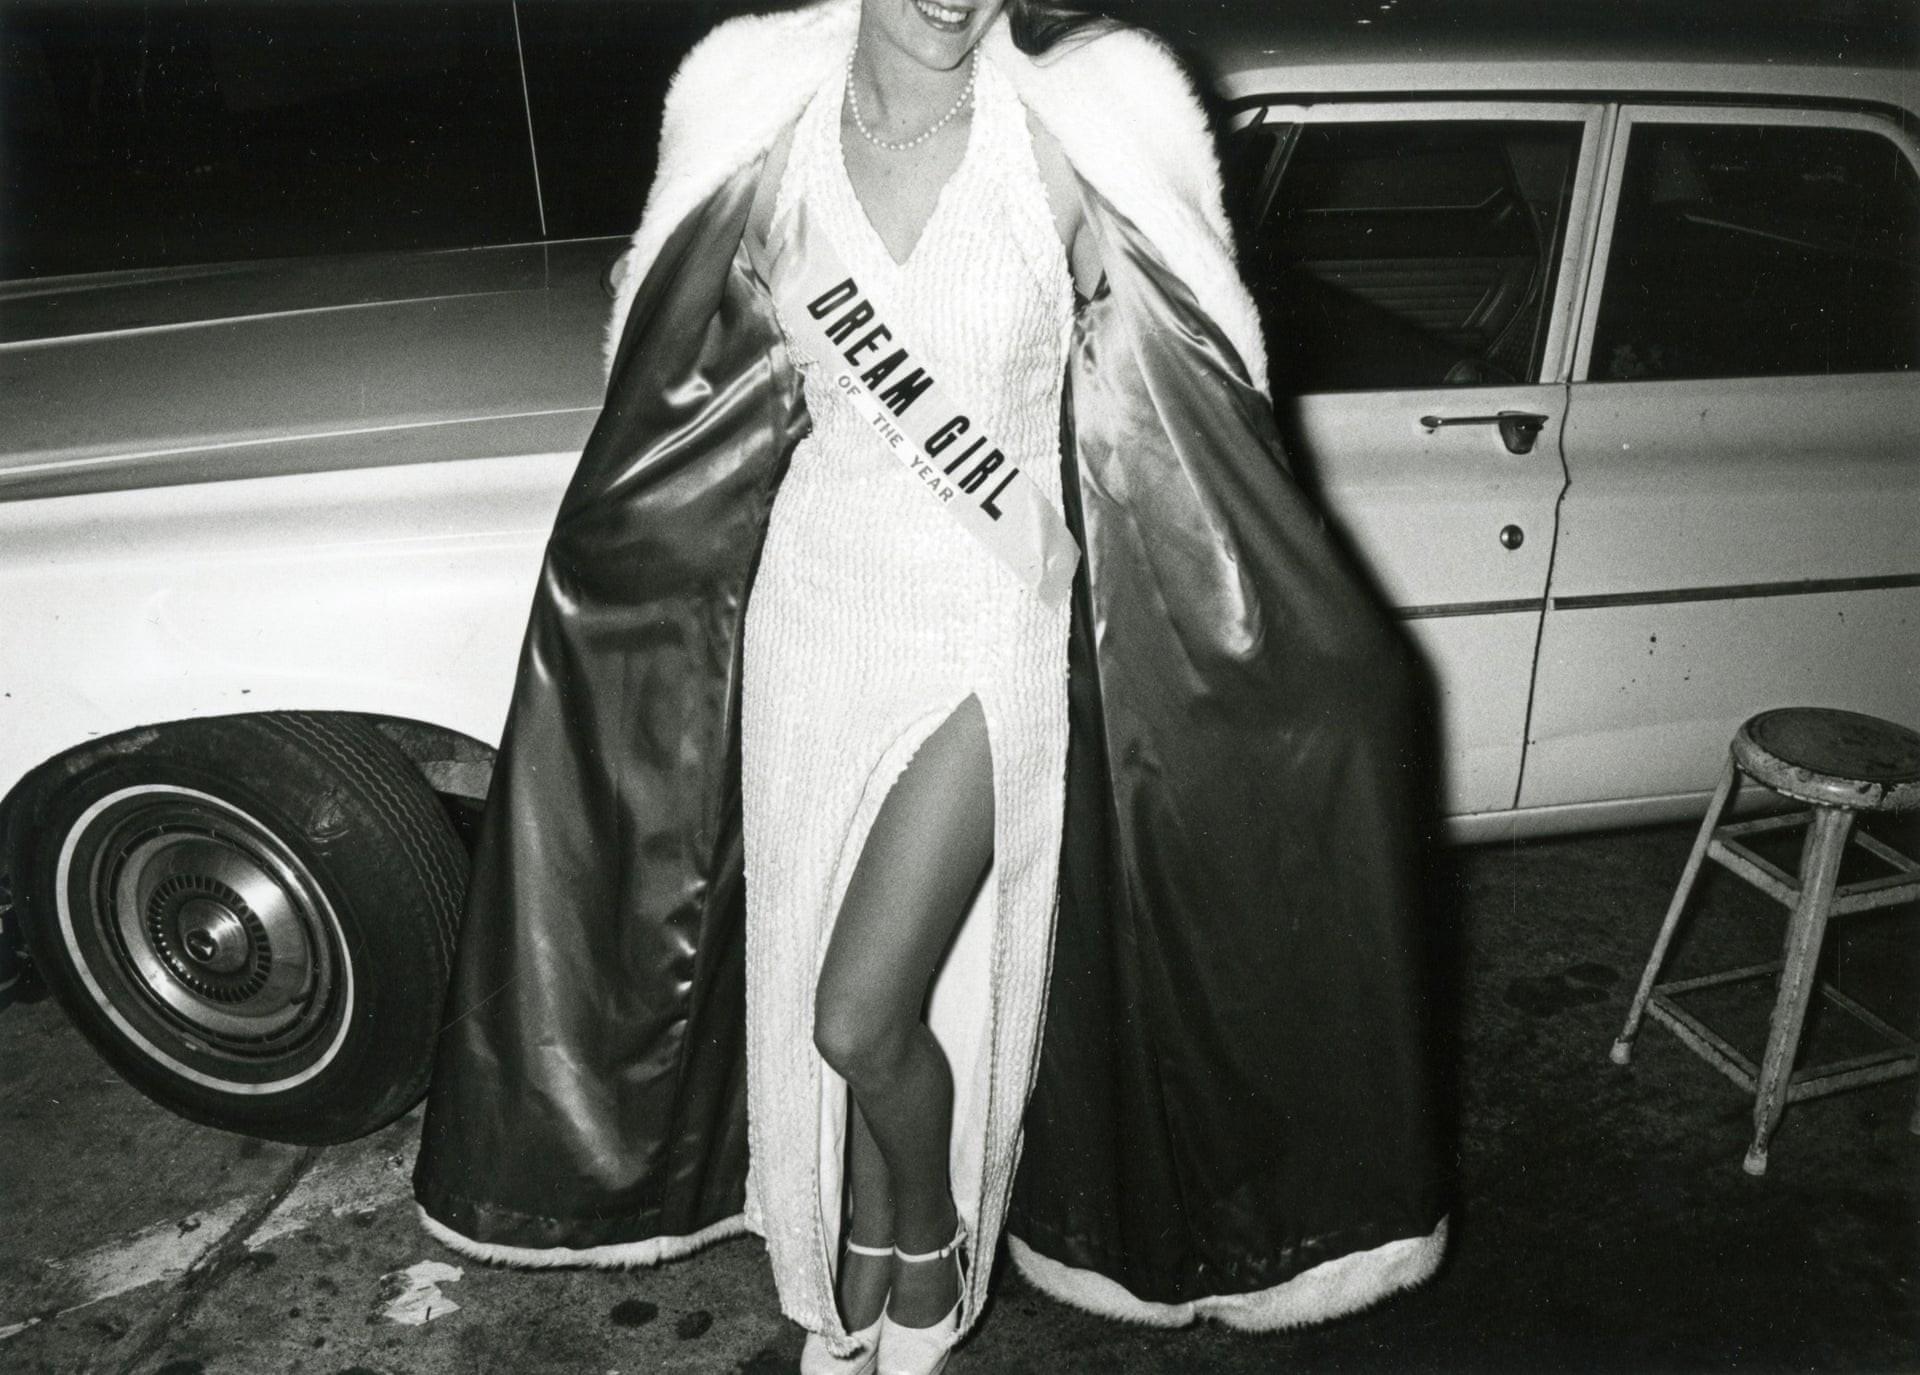 «Девушка мечты». Лос-Анджелес, 1978. Фотограф Гэри Крюгер